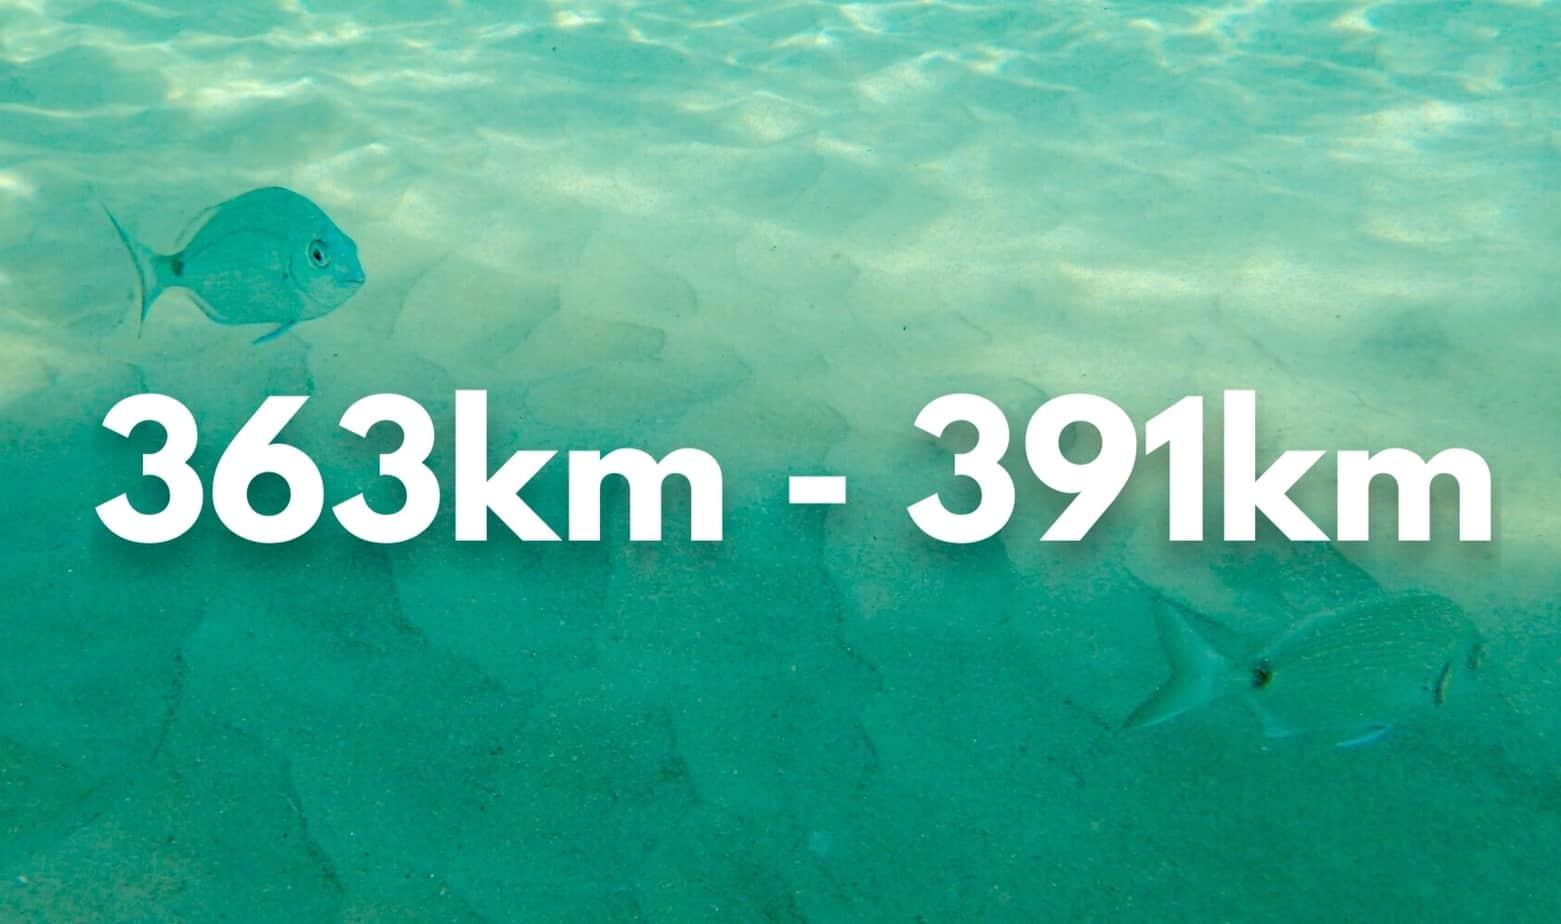 363 - 391km